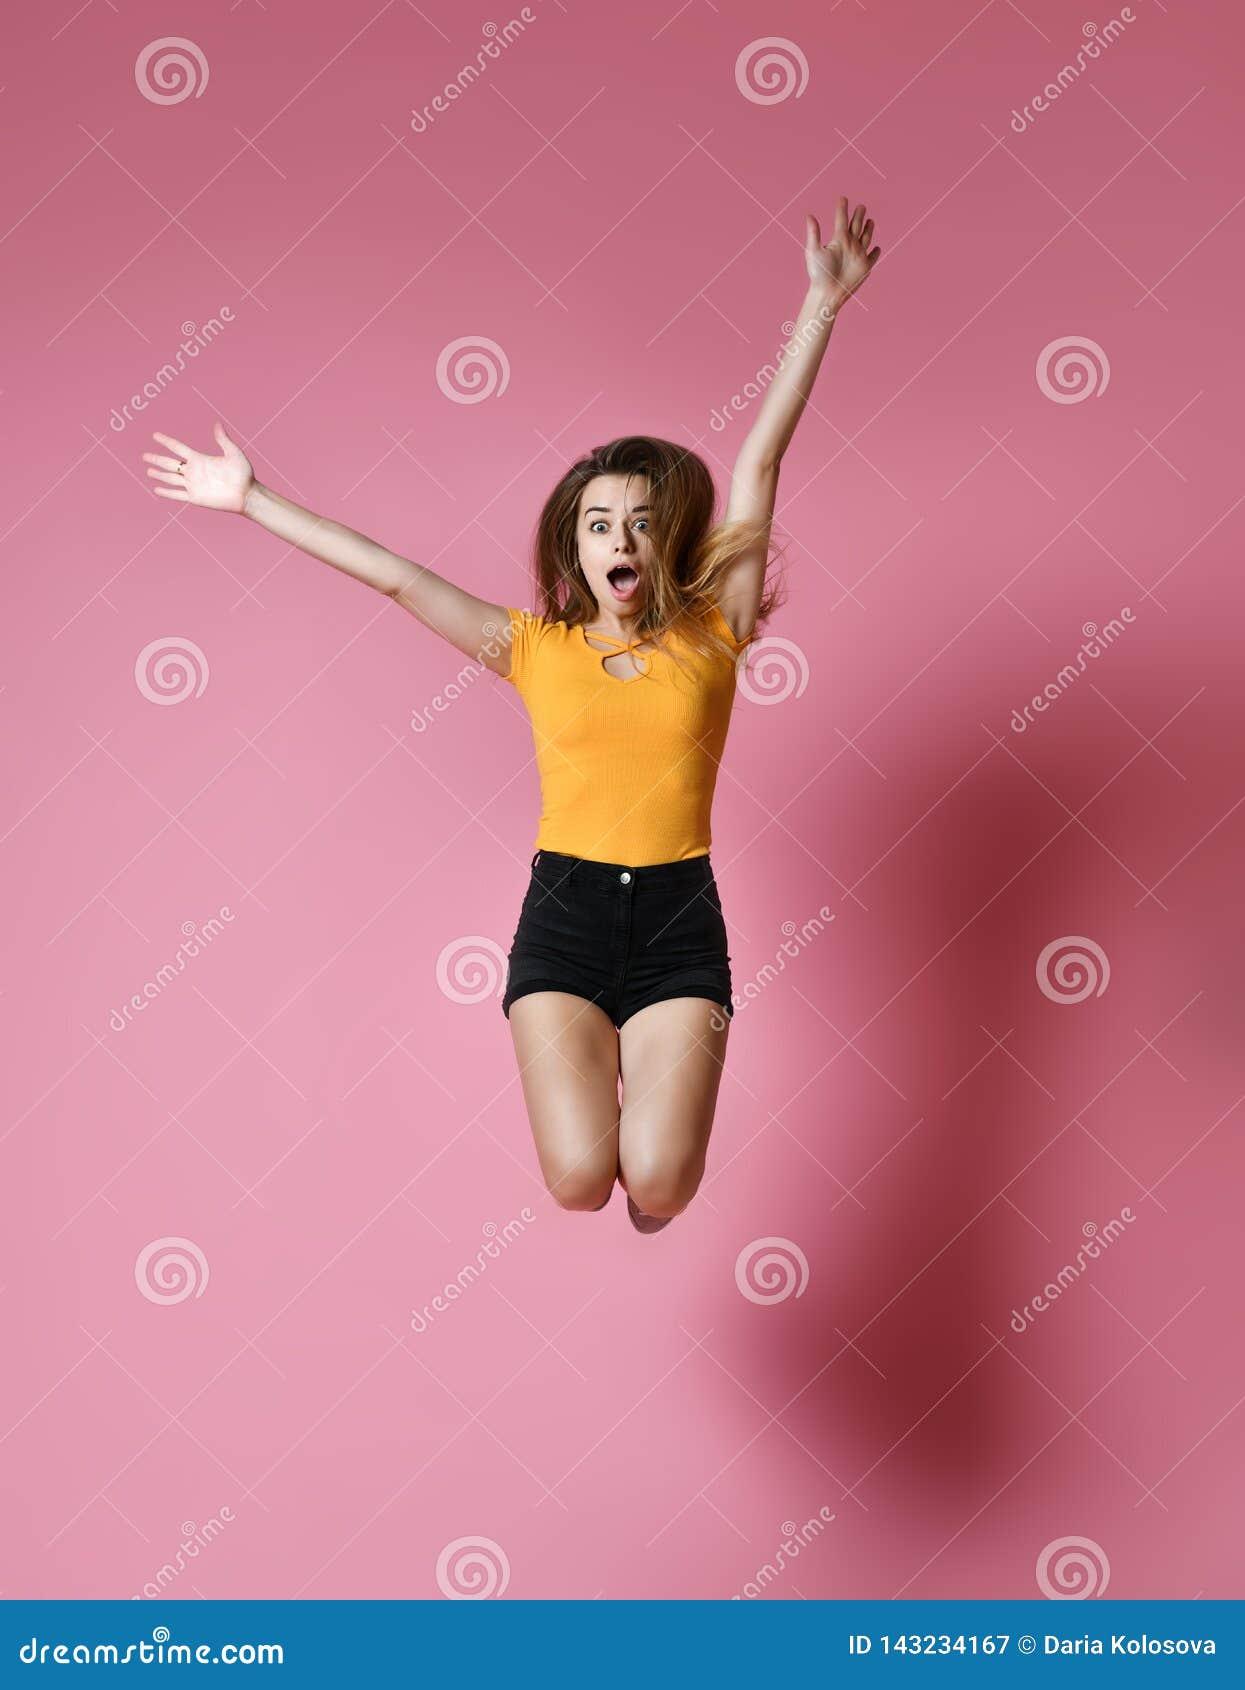 Retrato da menina positiva alegre que salta no ar que olha a câmera isolada no fundo cor-de-rosa